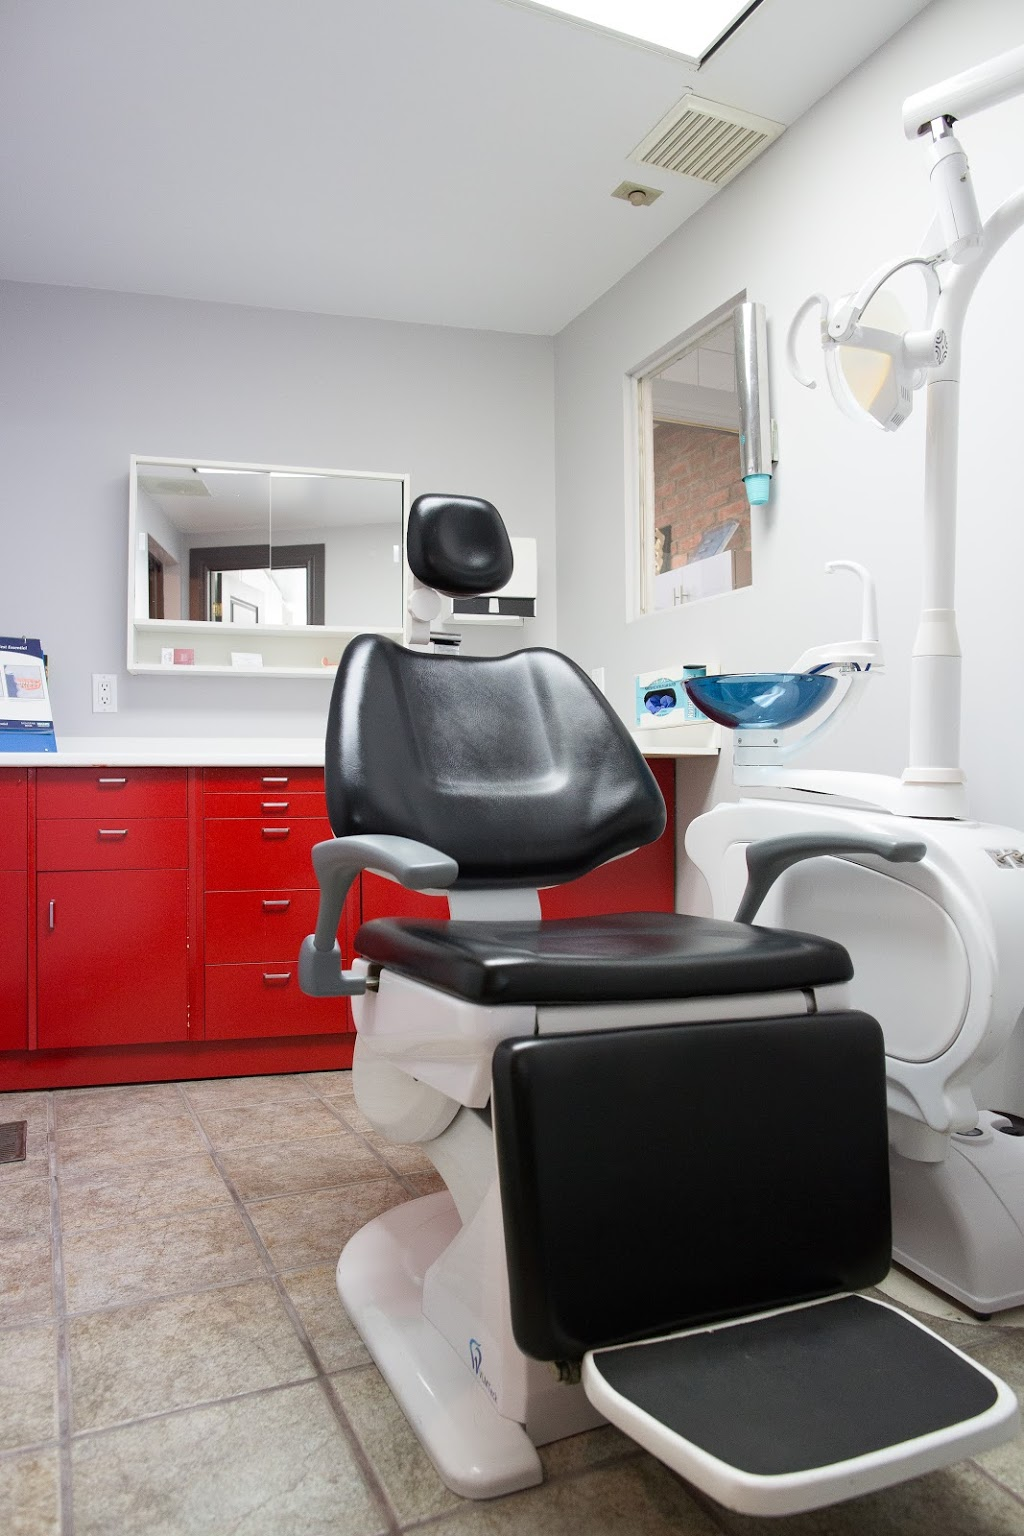 Les Centres Dentaires Sirois - Prothèses Dentaires - Limoilou &  | dentist | local 100, 51 Rue Marie-de-lIncarnation, Québec, QC G1N 3E5, Canada | 4185276449 OR +1 418-527-6449